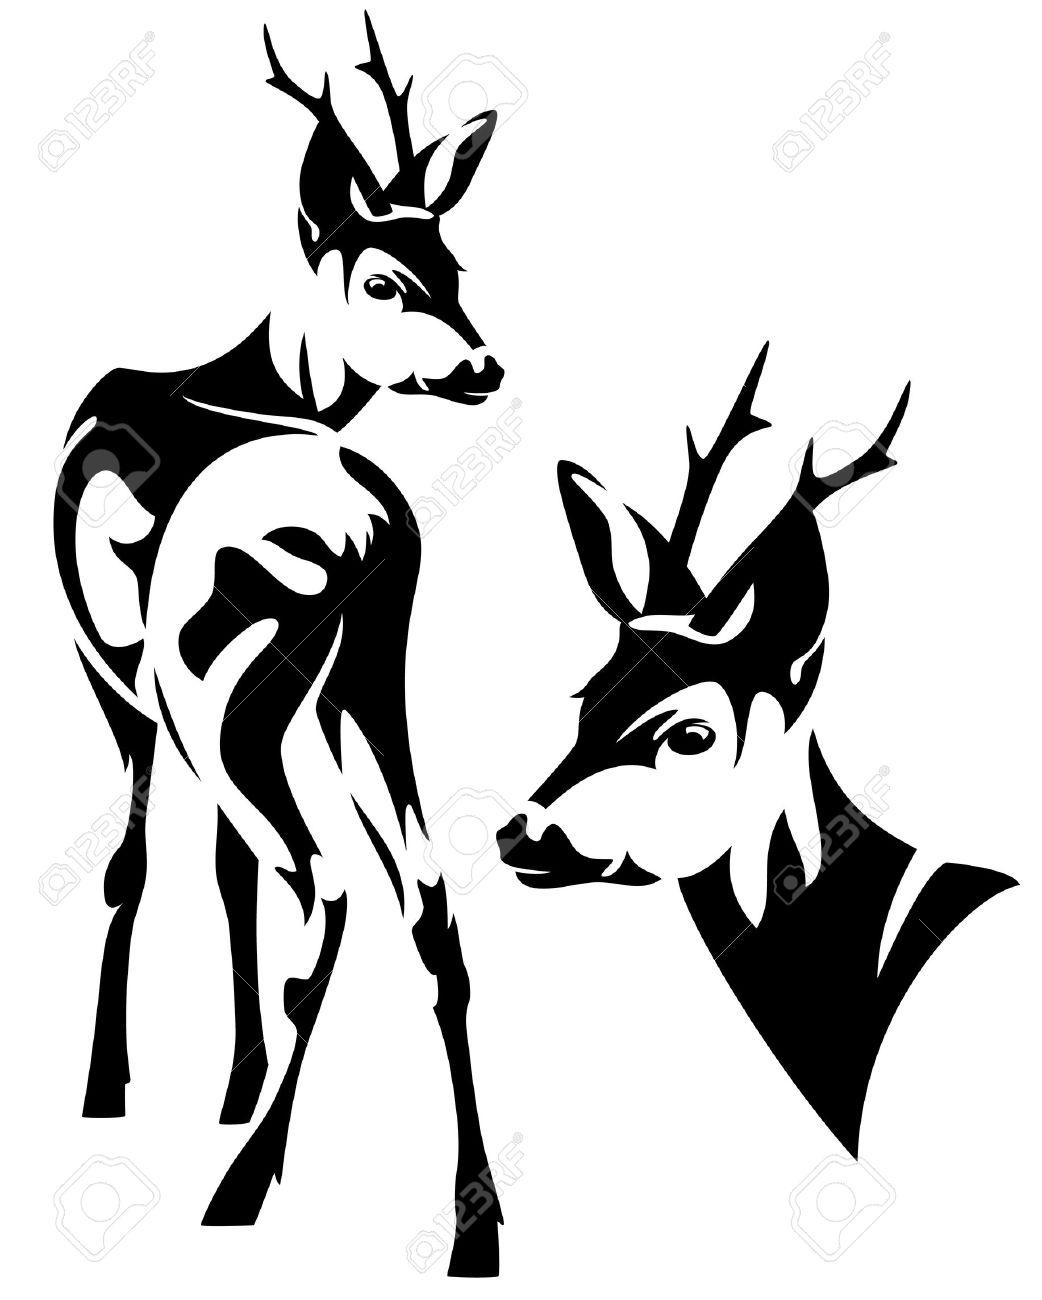 elegant roe deer Capreolus capreolus black and white vector outline - standing animal and head design - 25550376